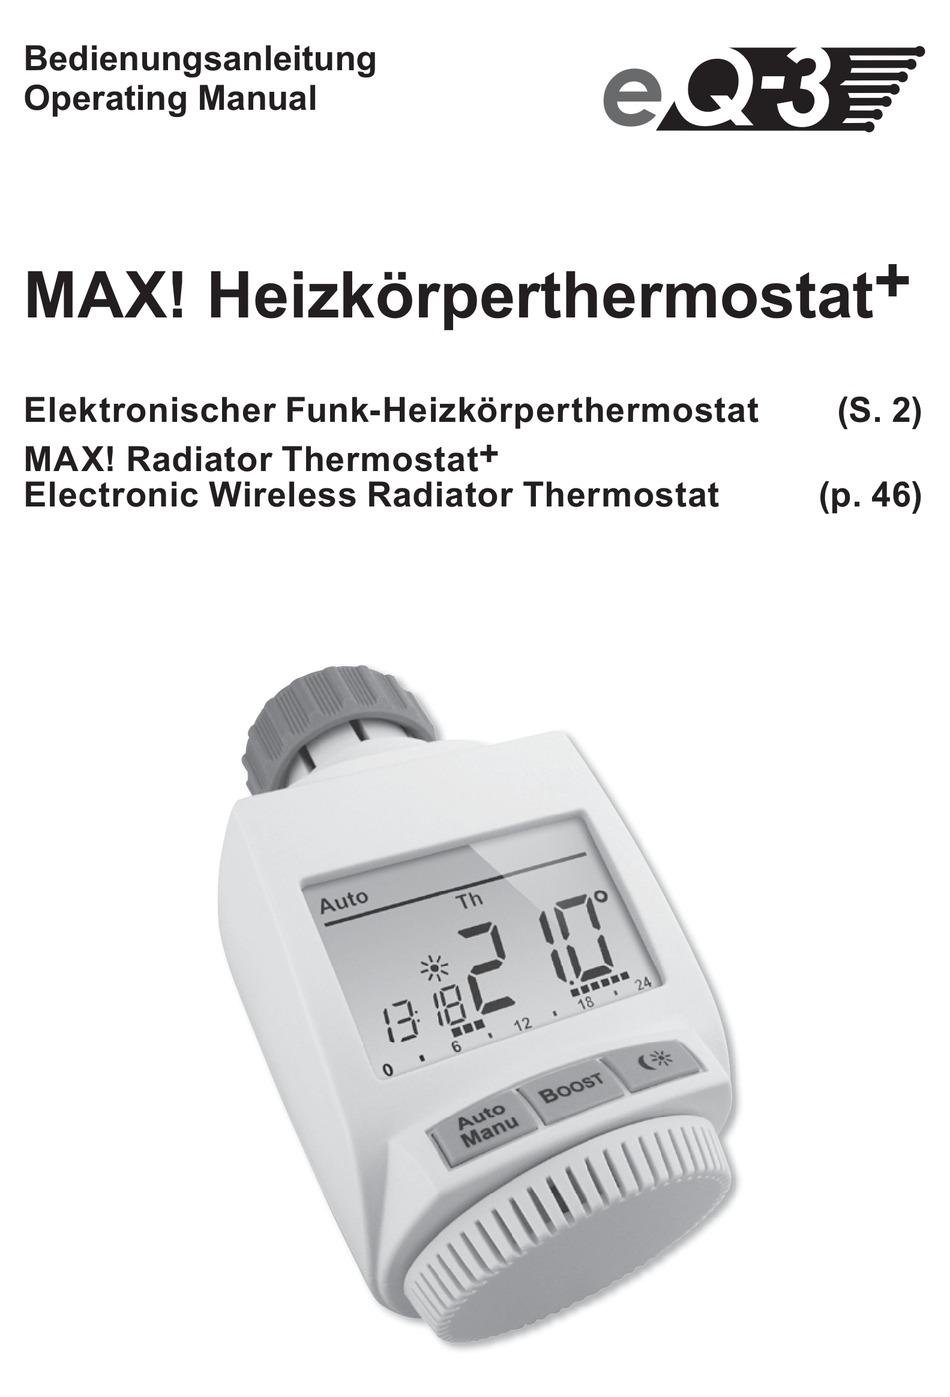 eQ-3 CC-RT-M-EQ Heizkörperthermostat elektronisch